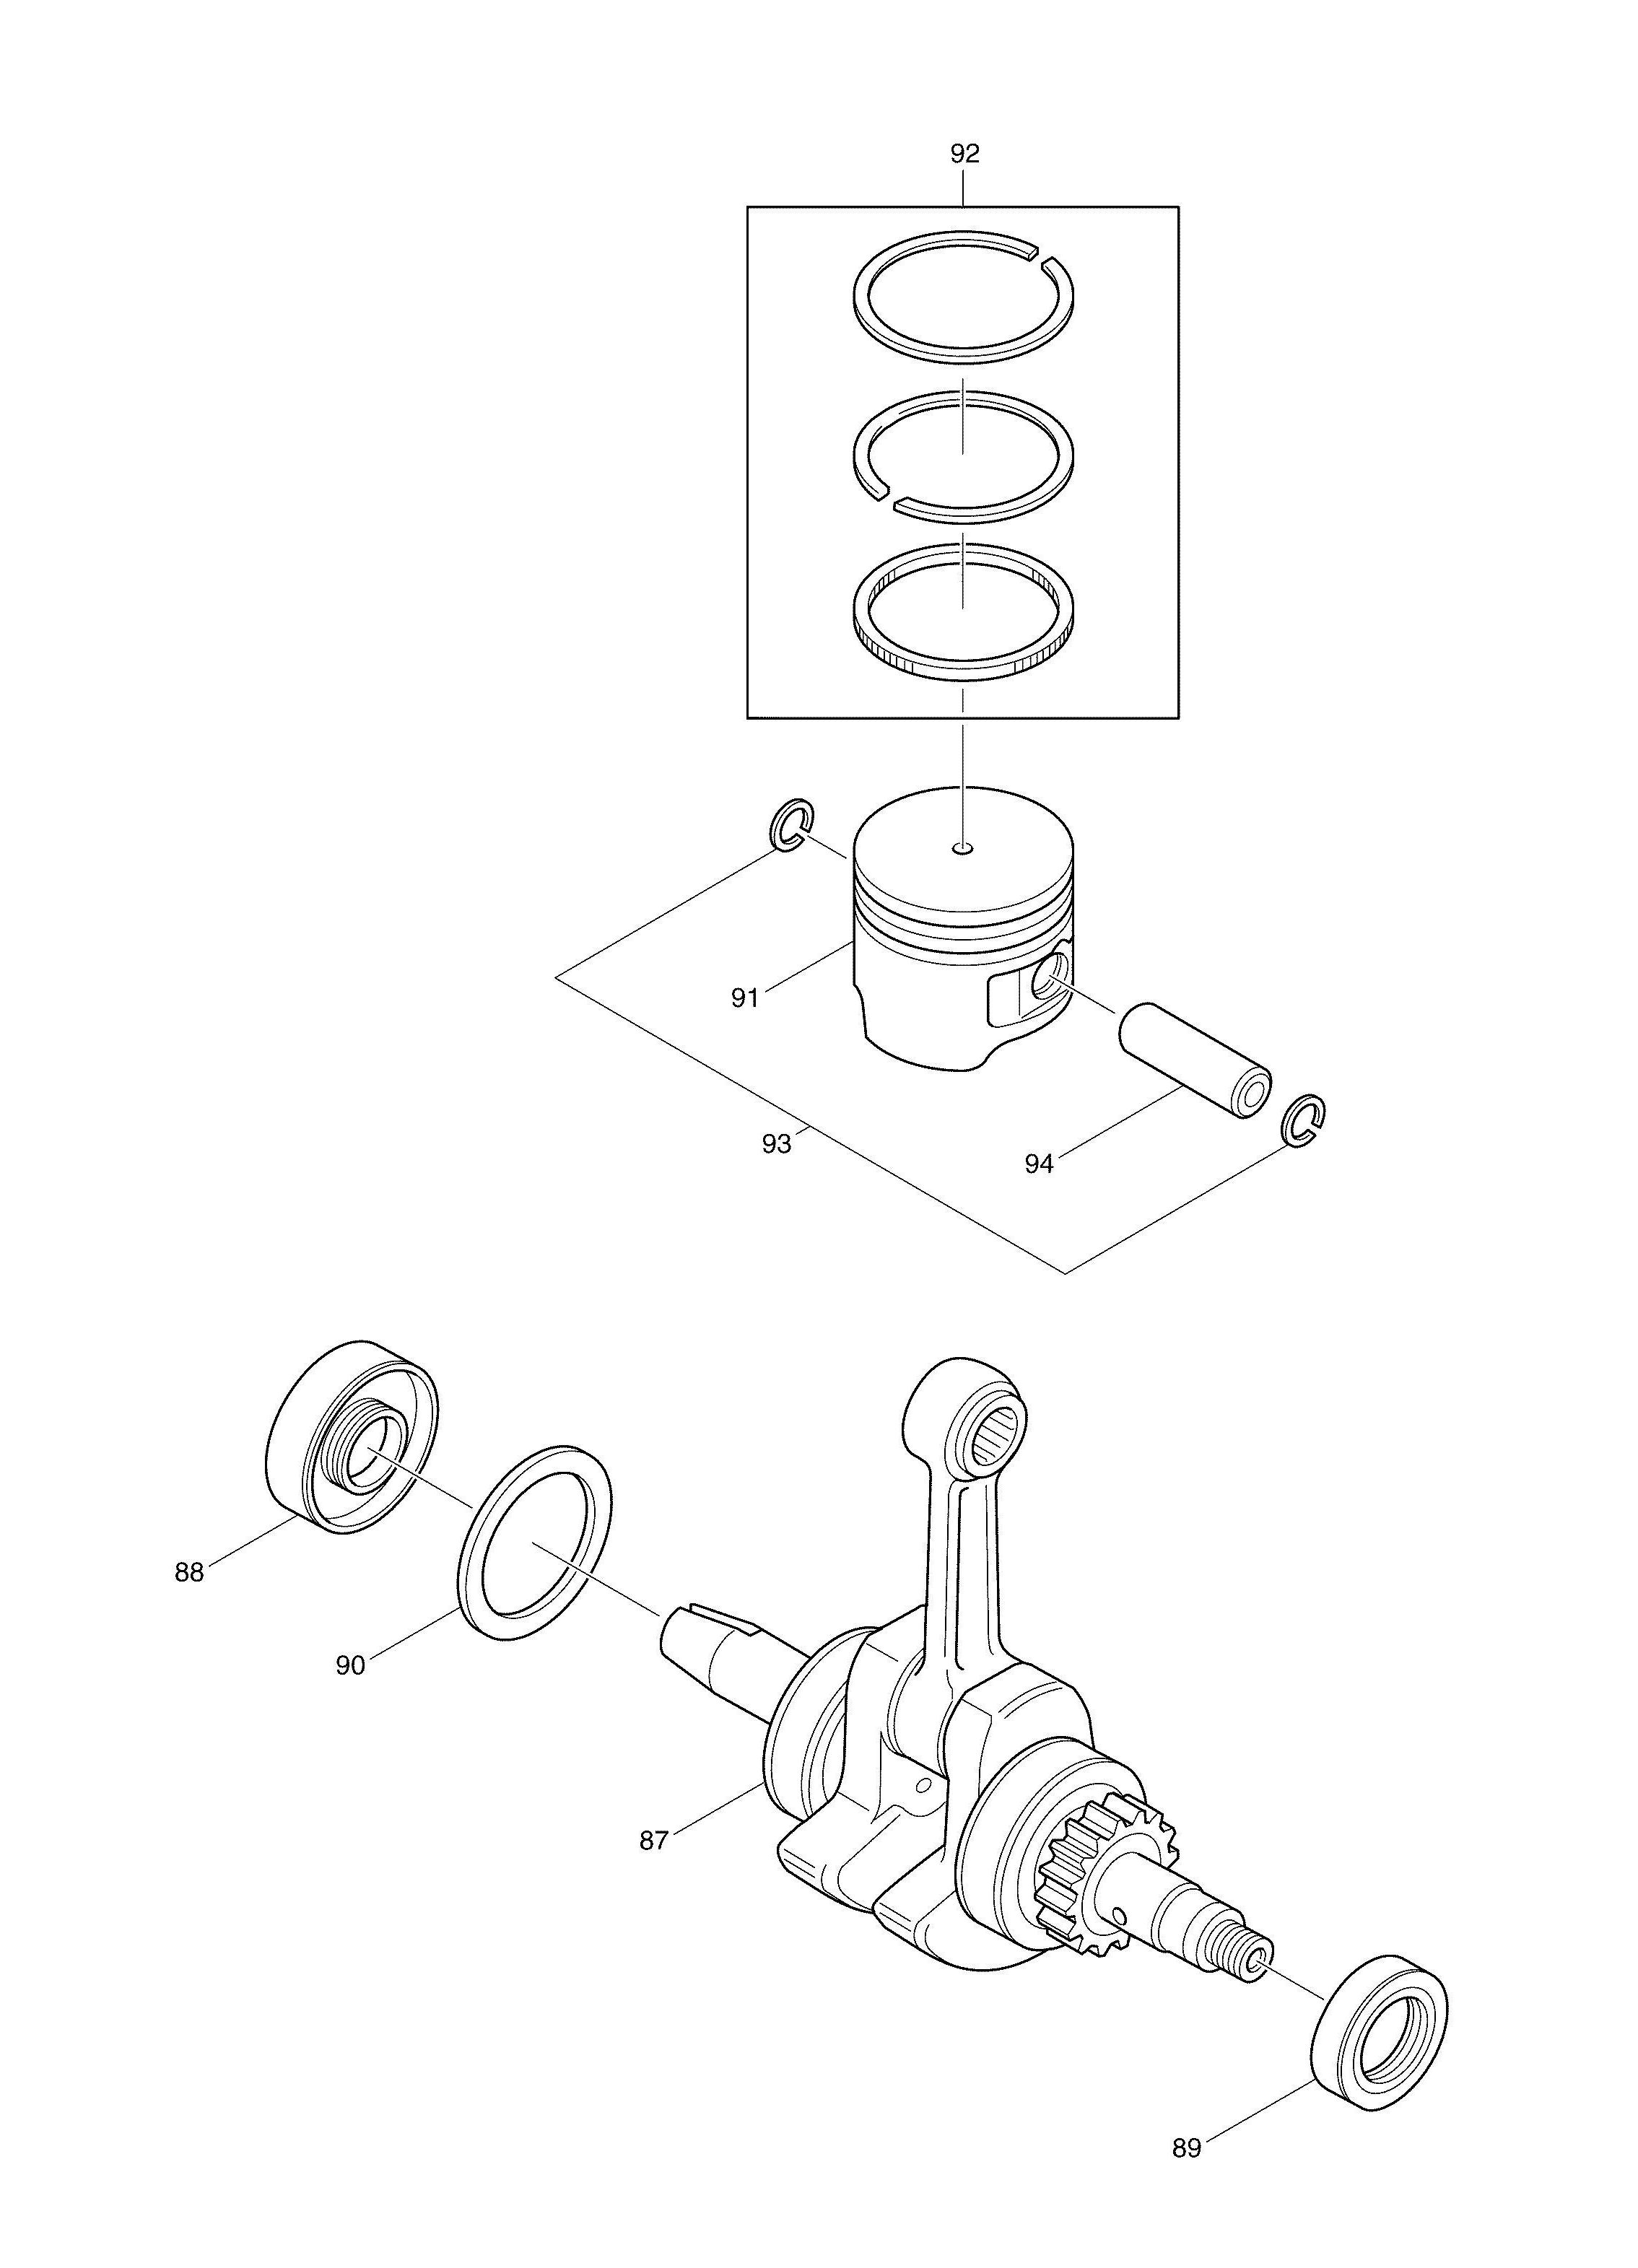 Makita Bcx2500 4 Stroke Brushcutter Spare Parts SPARE